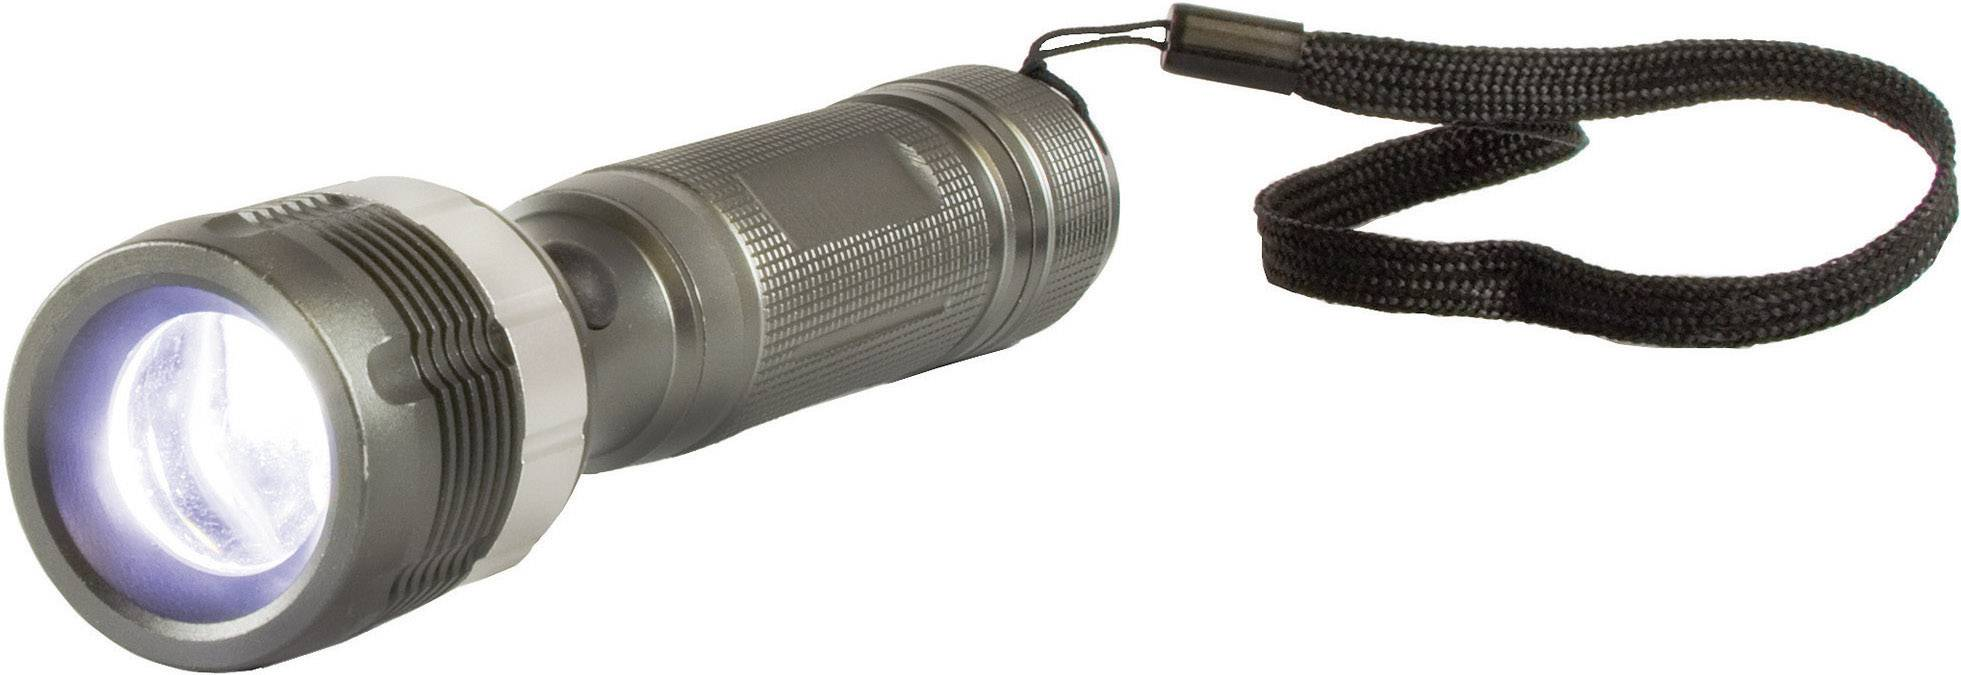 Vreckové LED svietidlo Arcas 3 WZoom, vrátane 3 AAA batérií